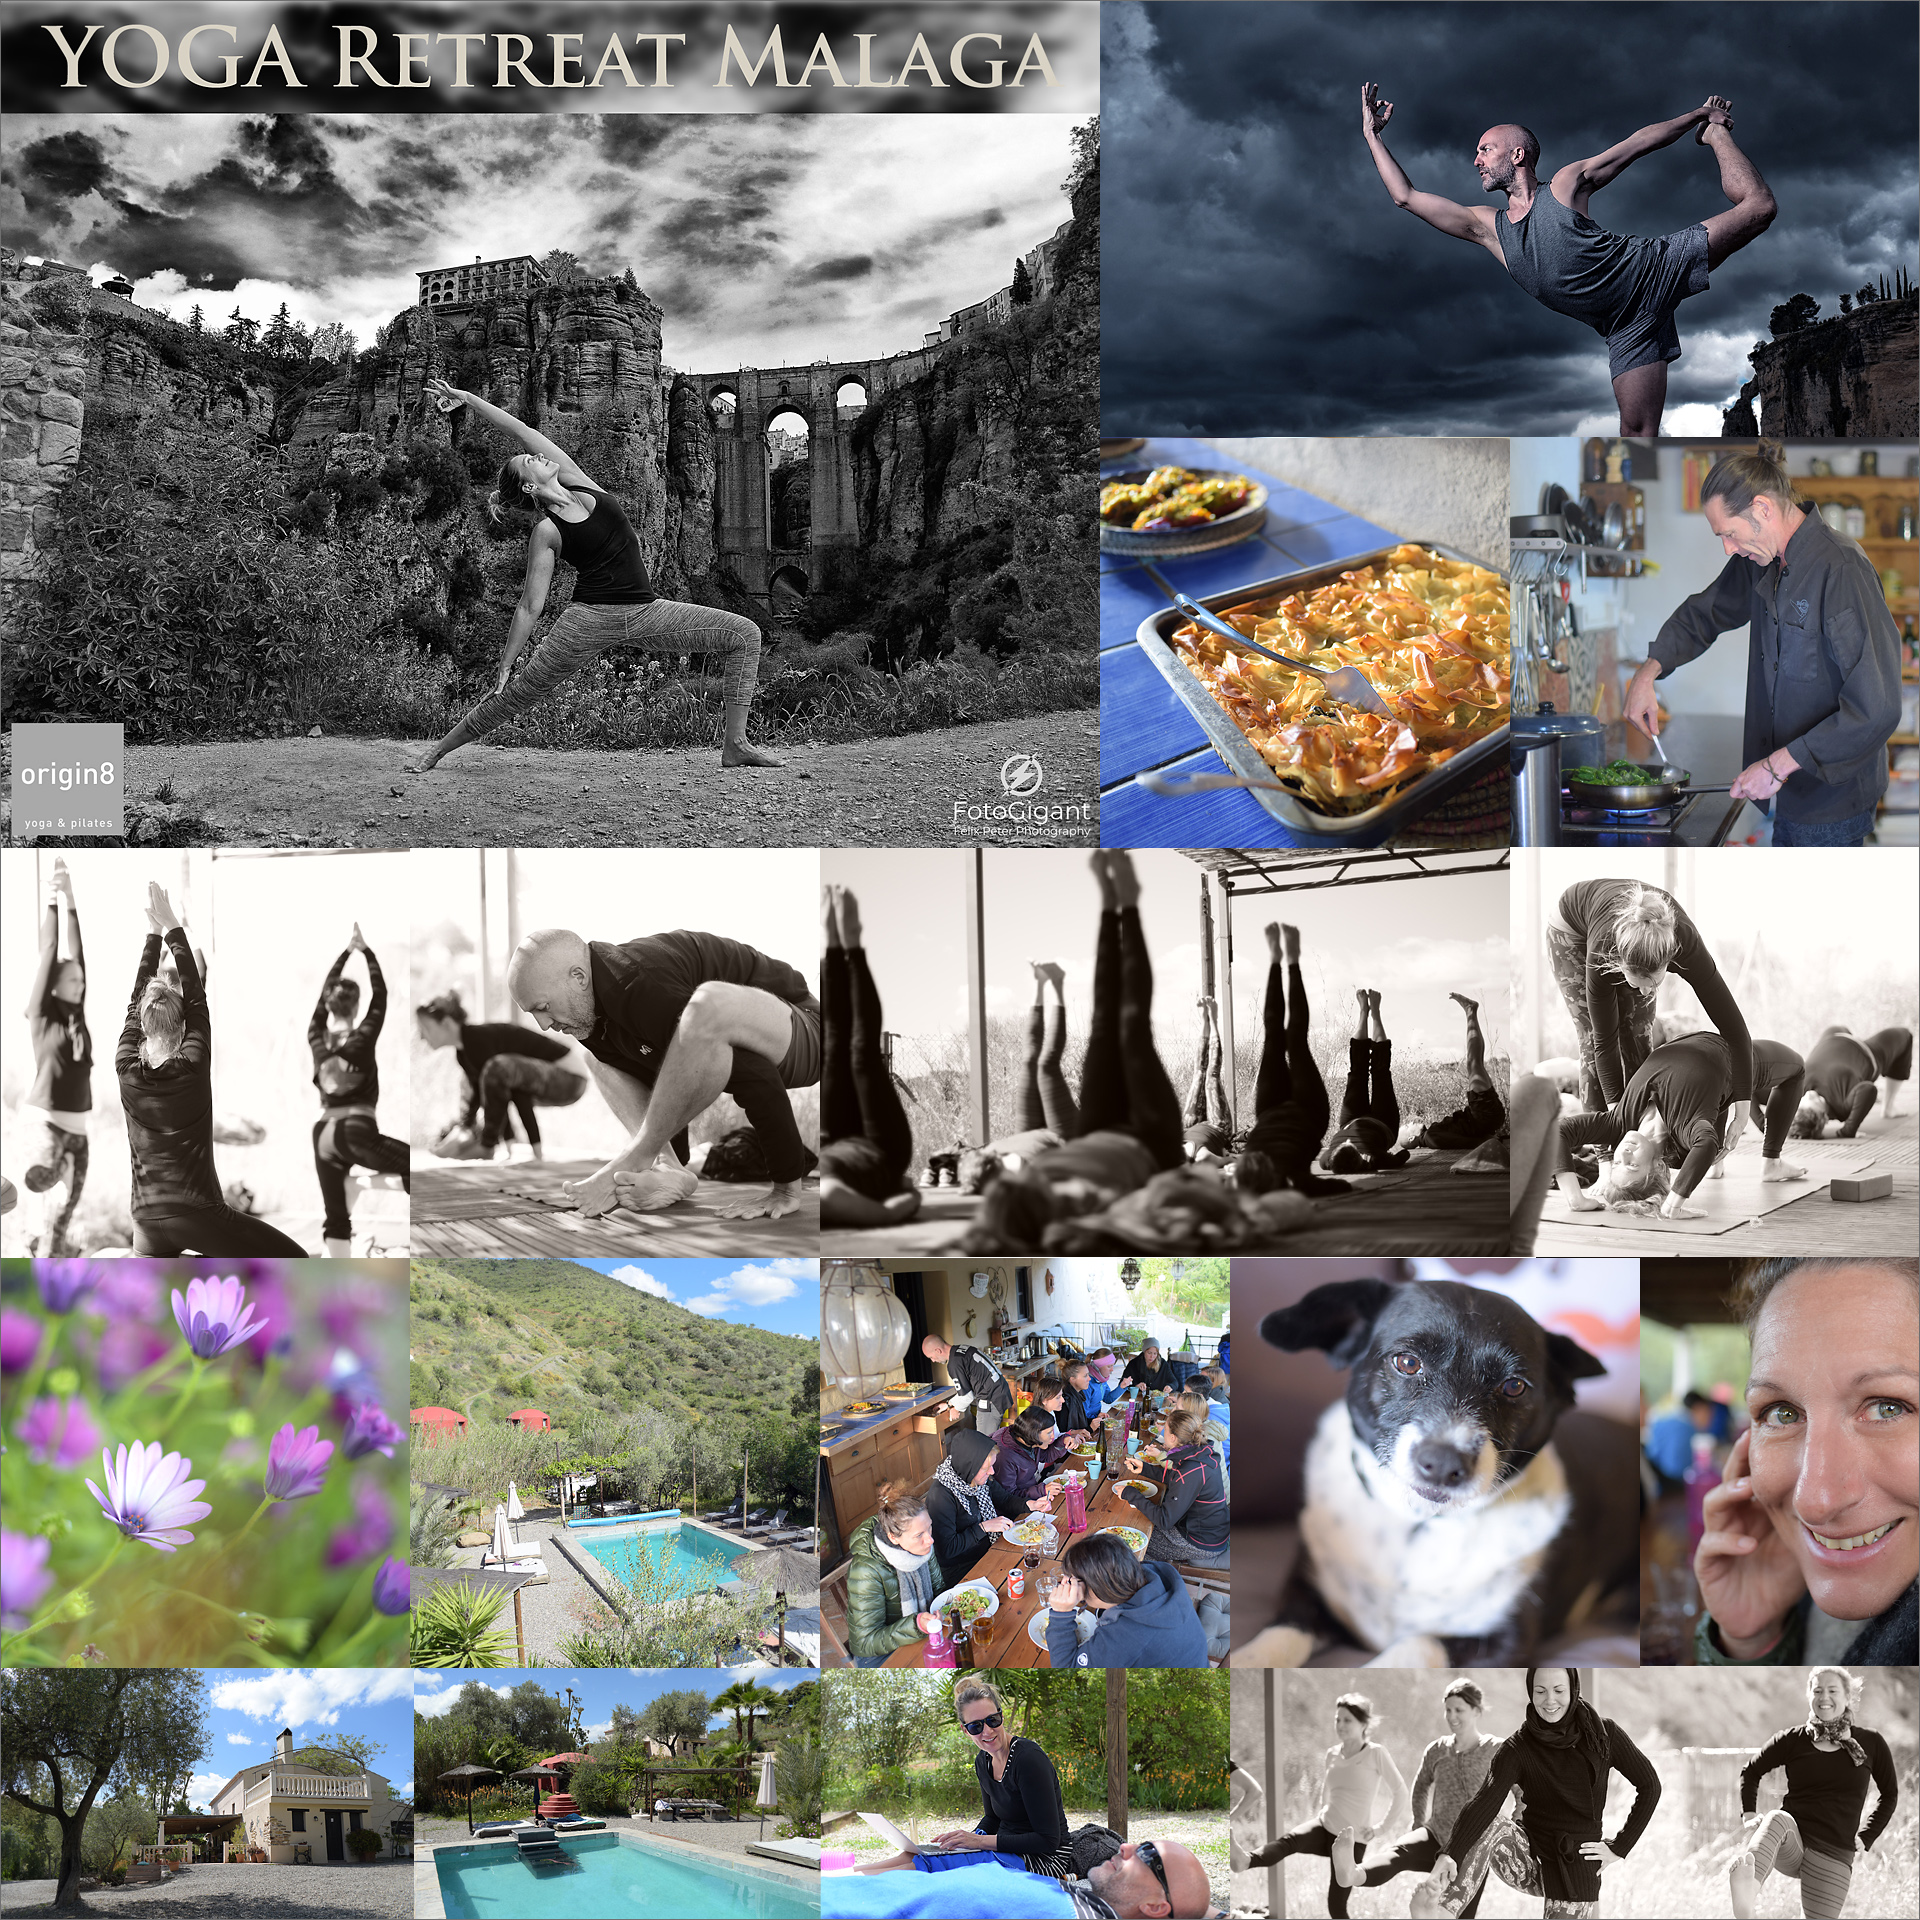 Malaga-Yoga-Retreat-by-Origin8_Anita-Preece.jpg